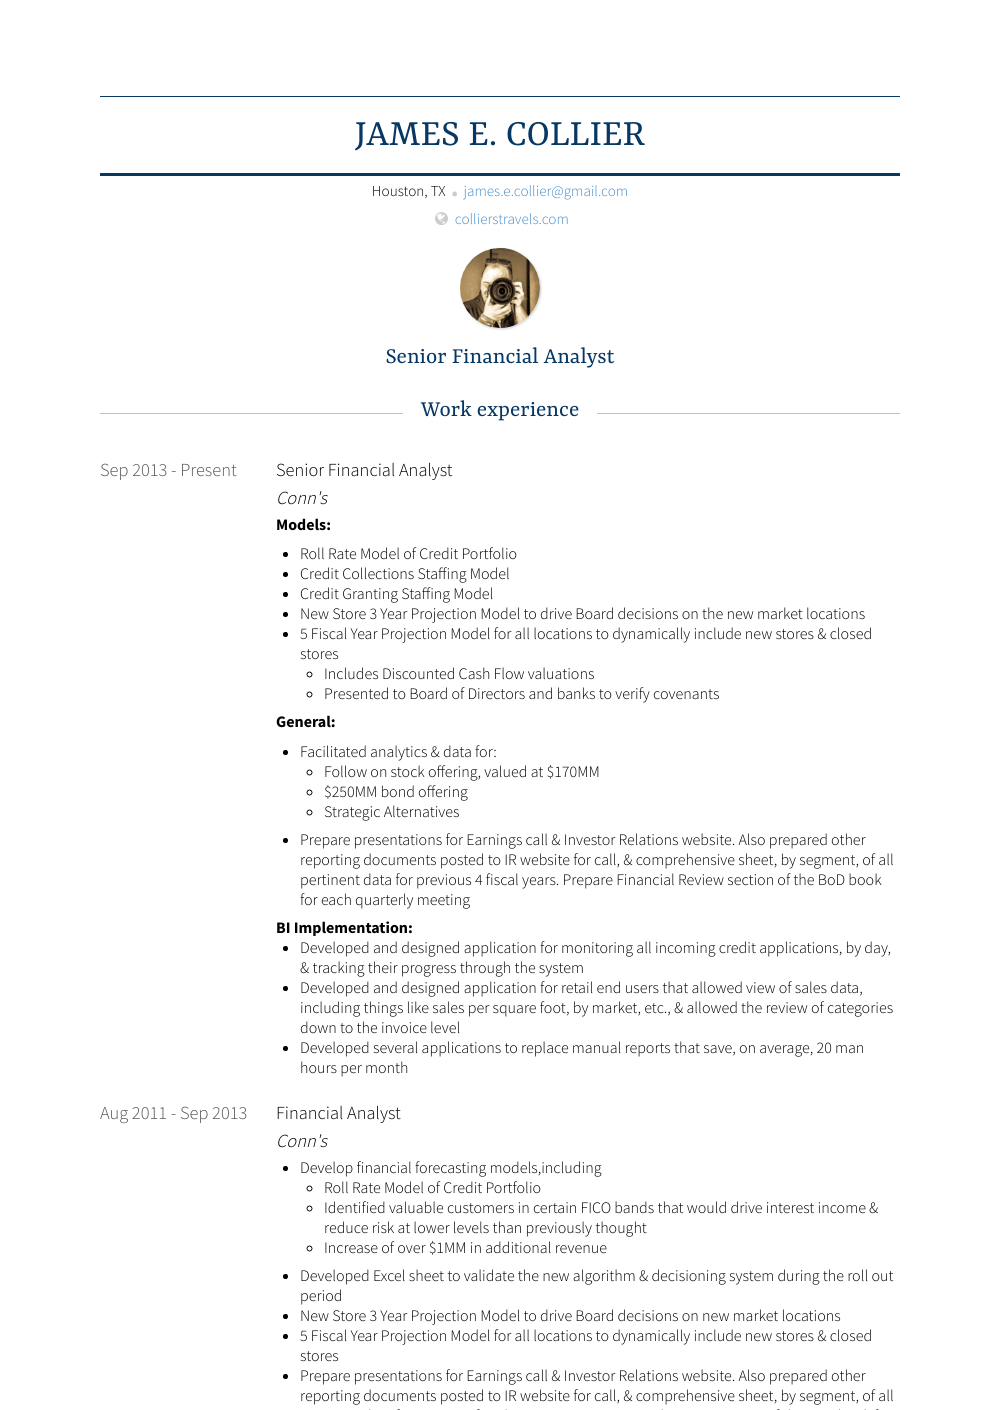 Senior Financial Analyst Resume Sample